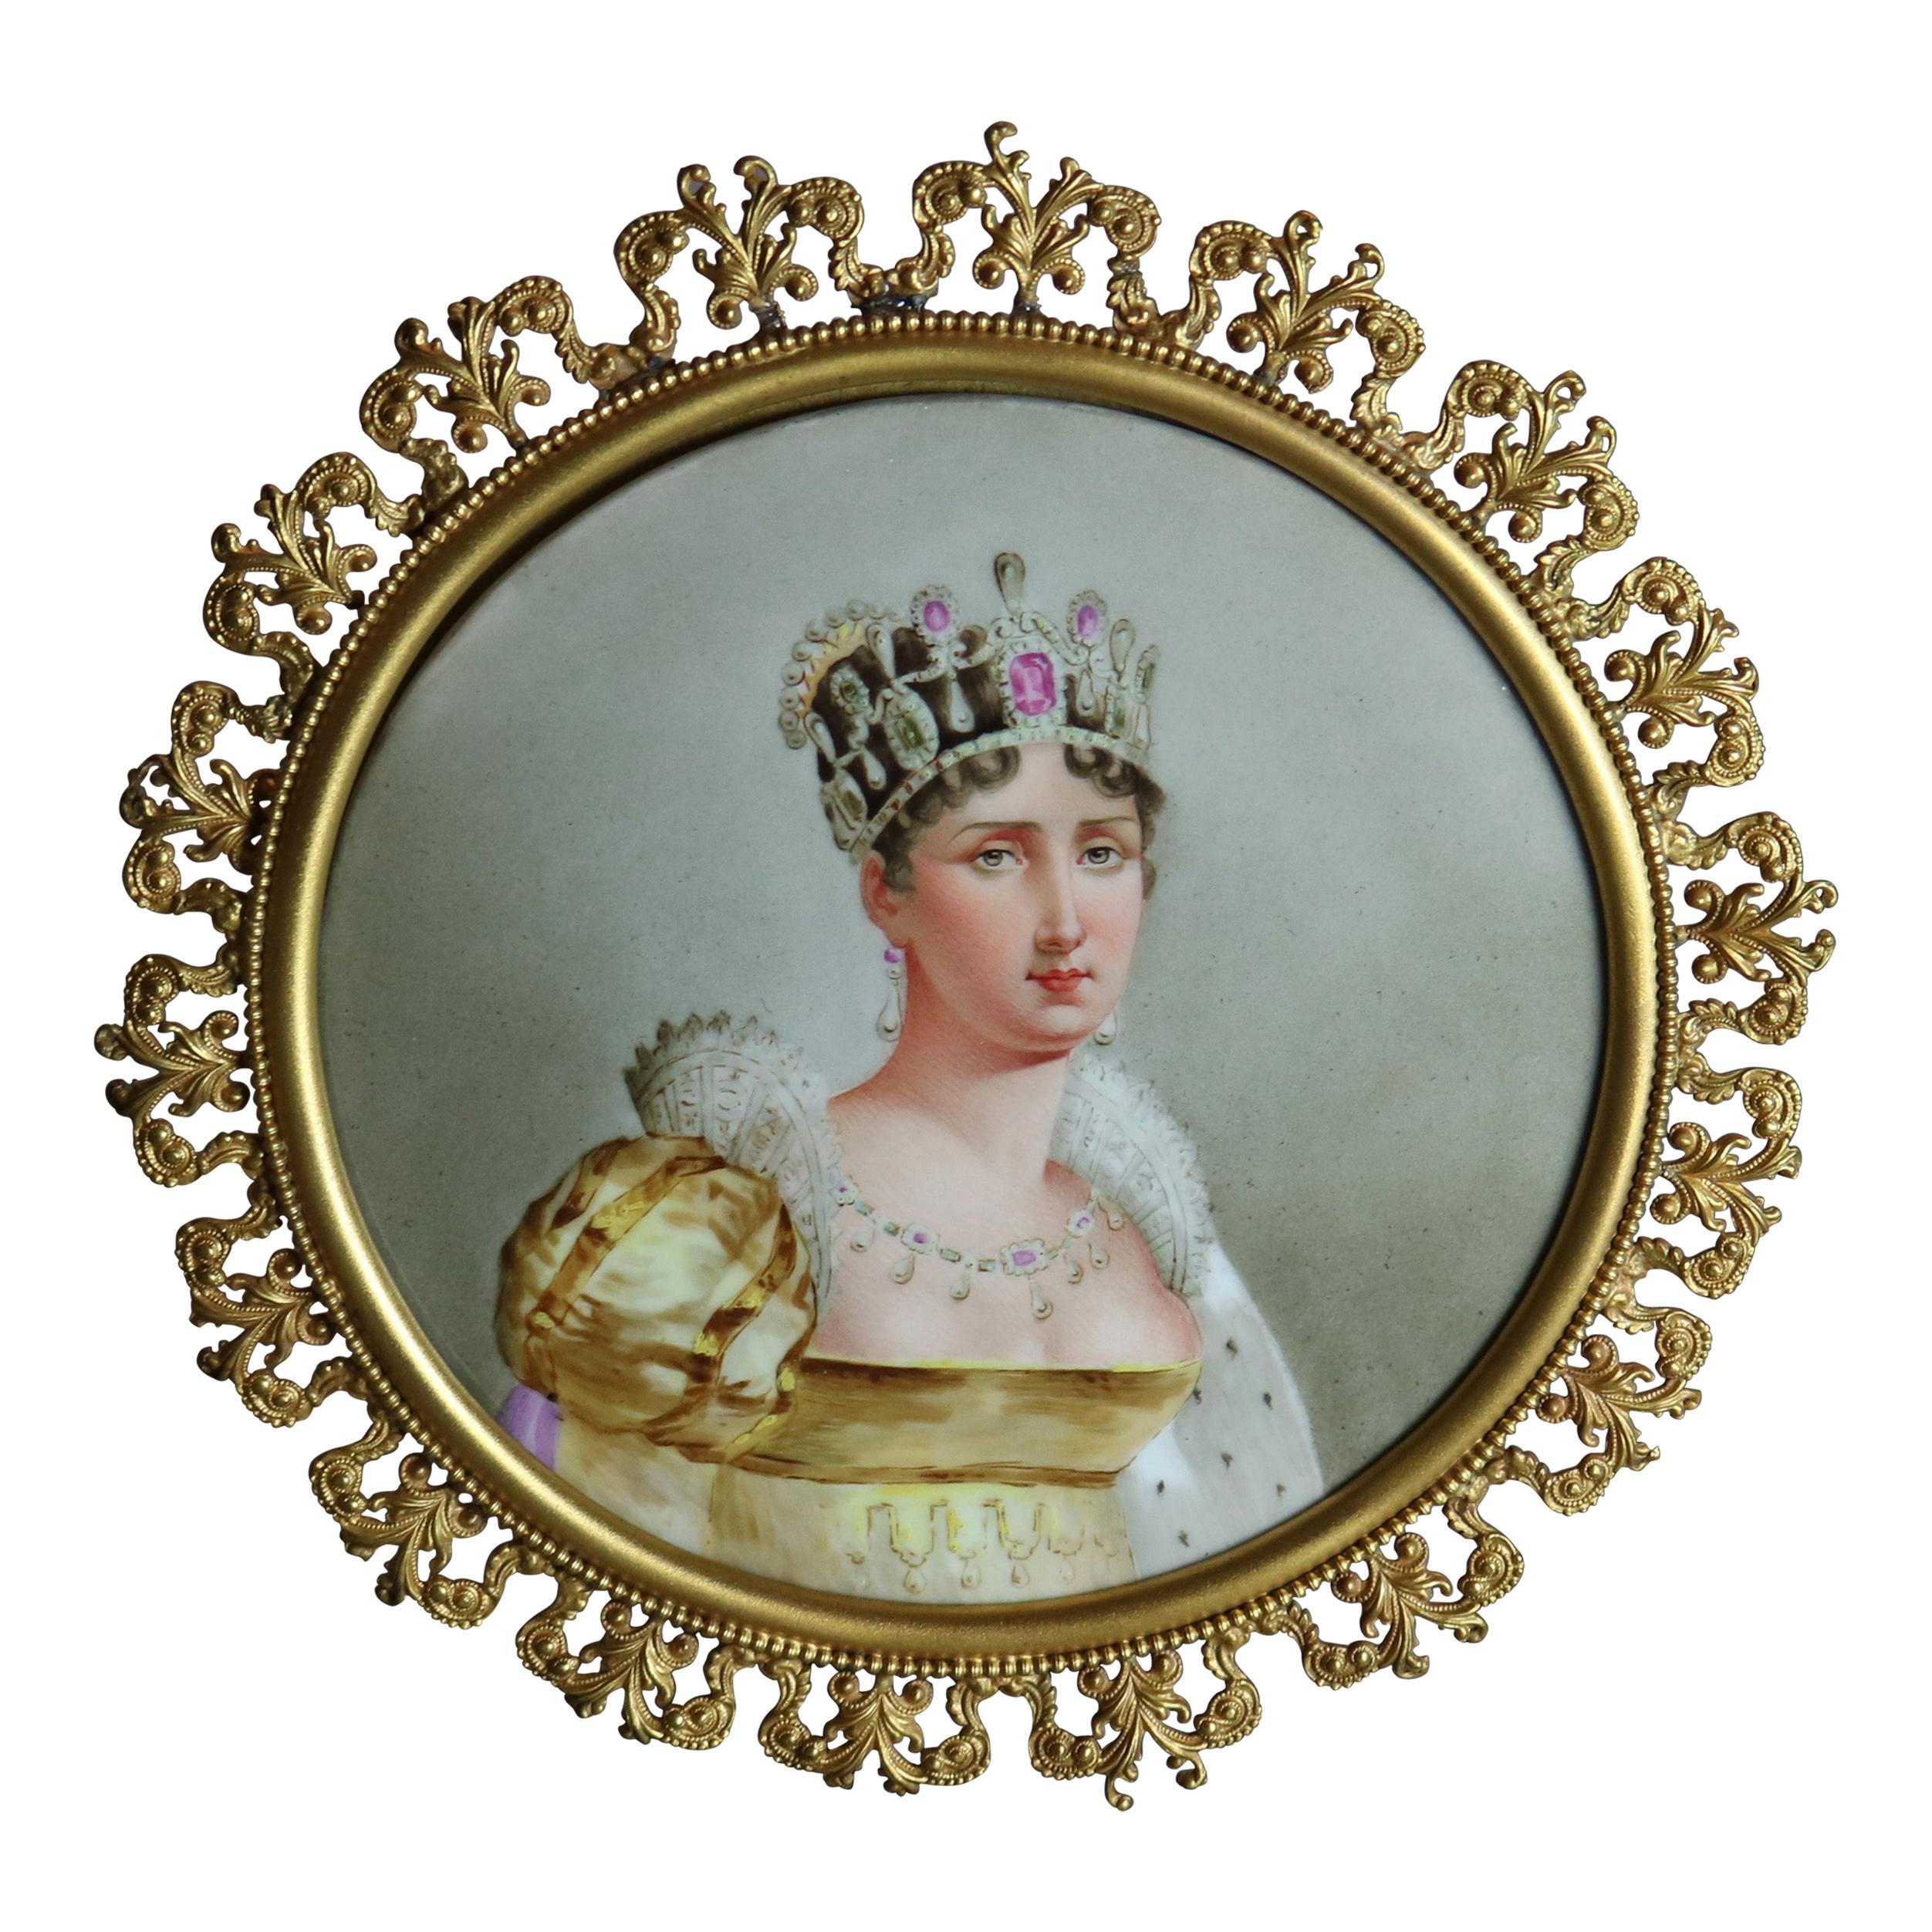 Antique Napoleonic Portrait Painting on Porcelain of Queen Josephine, 19th C